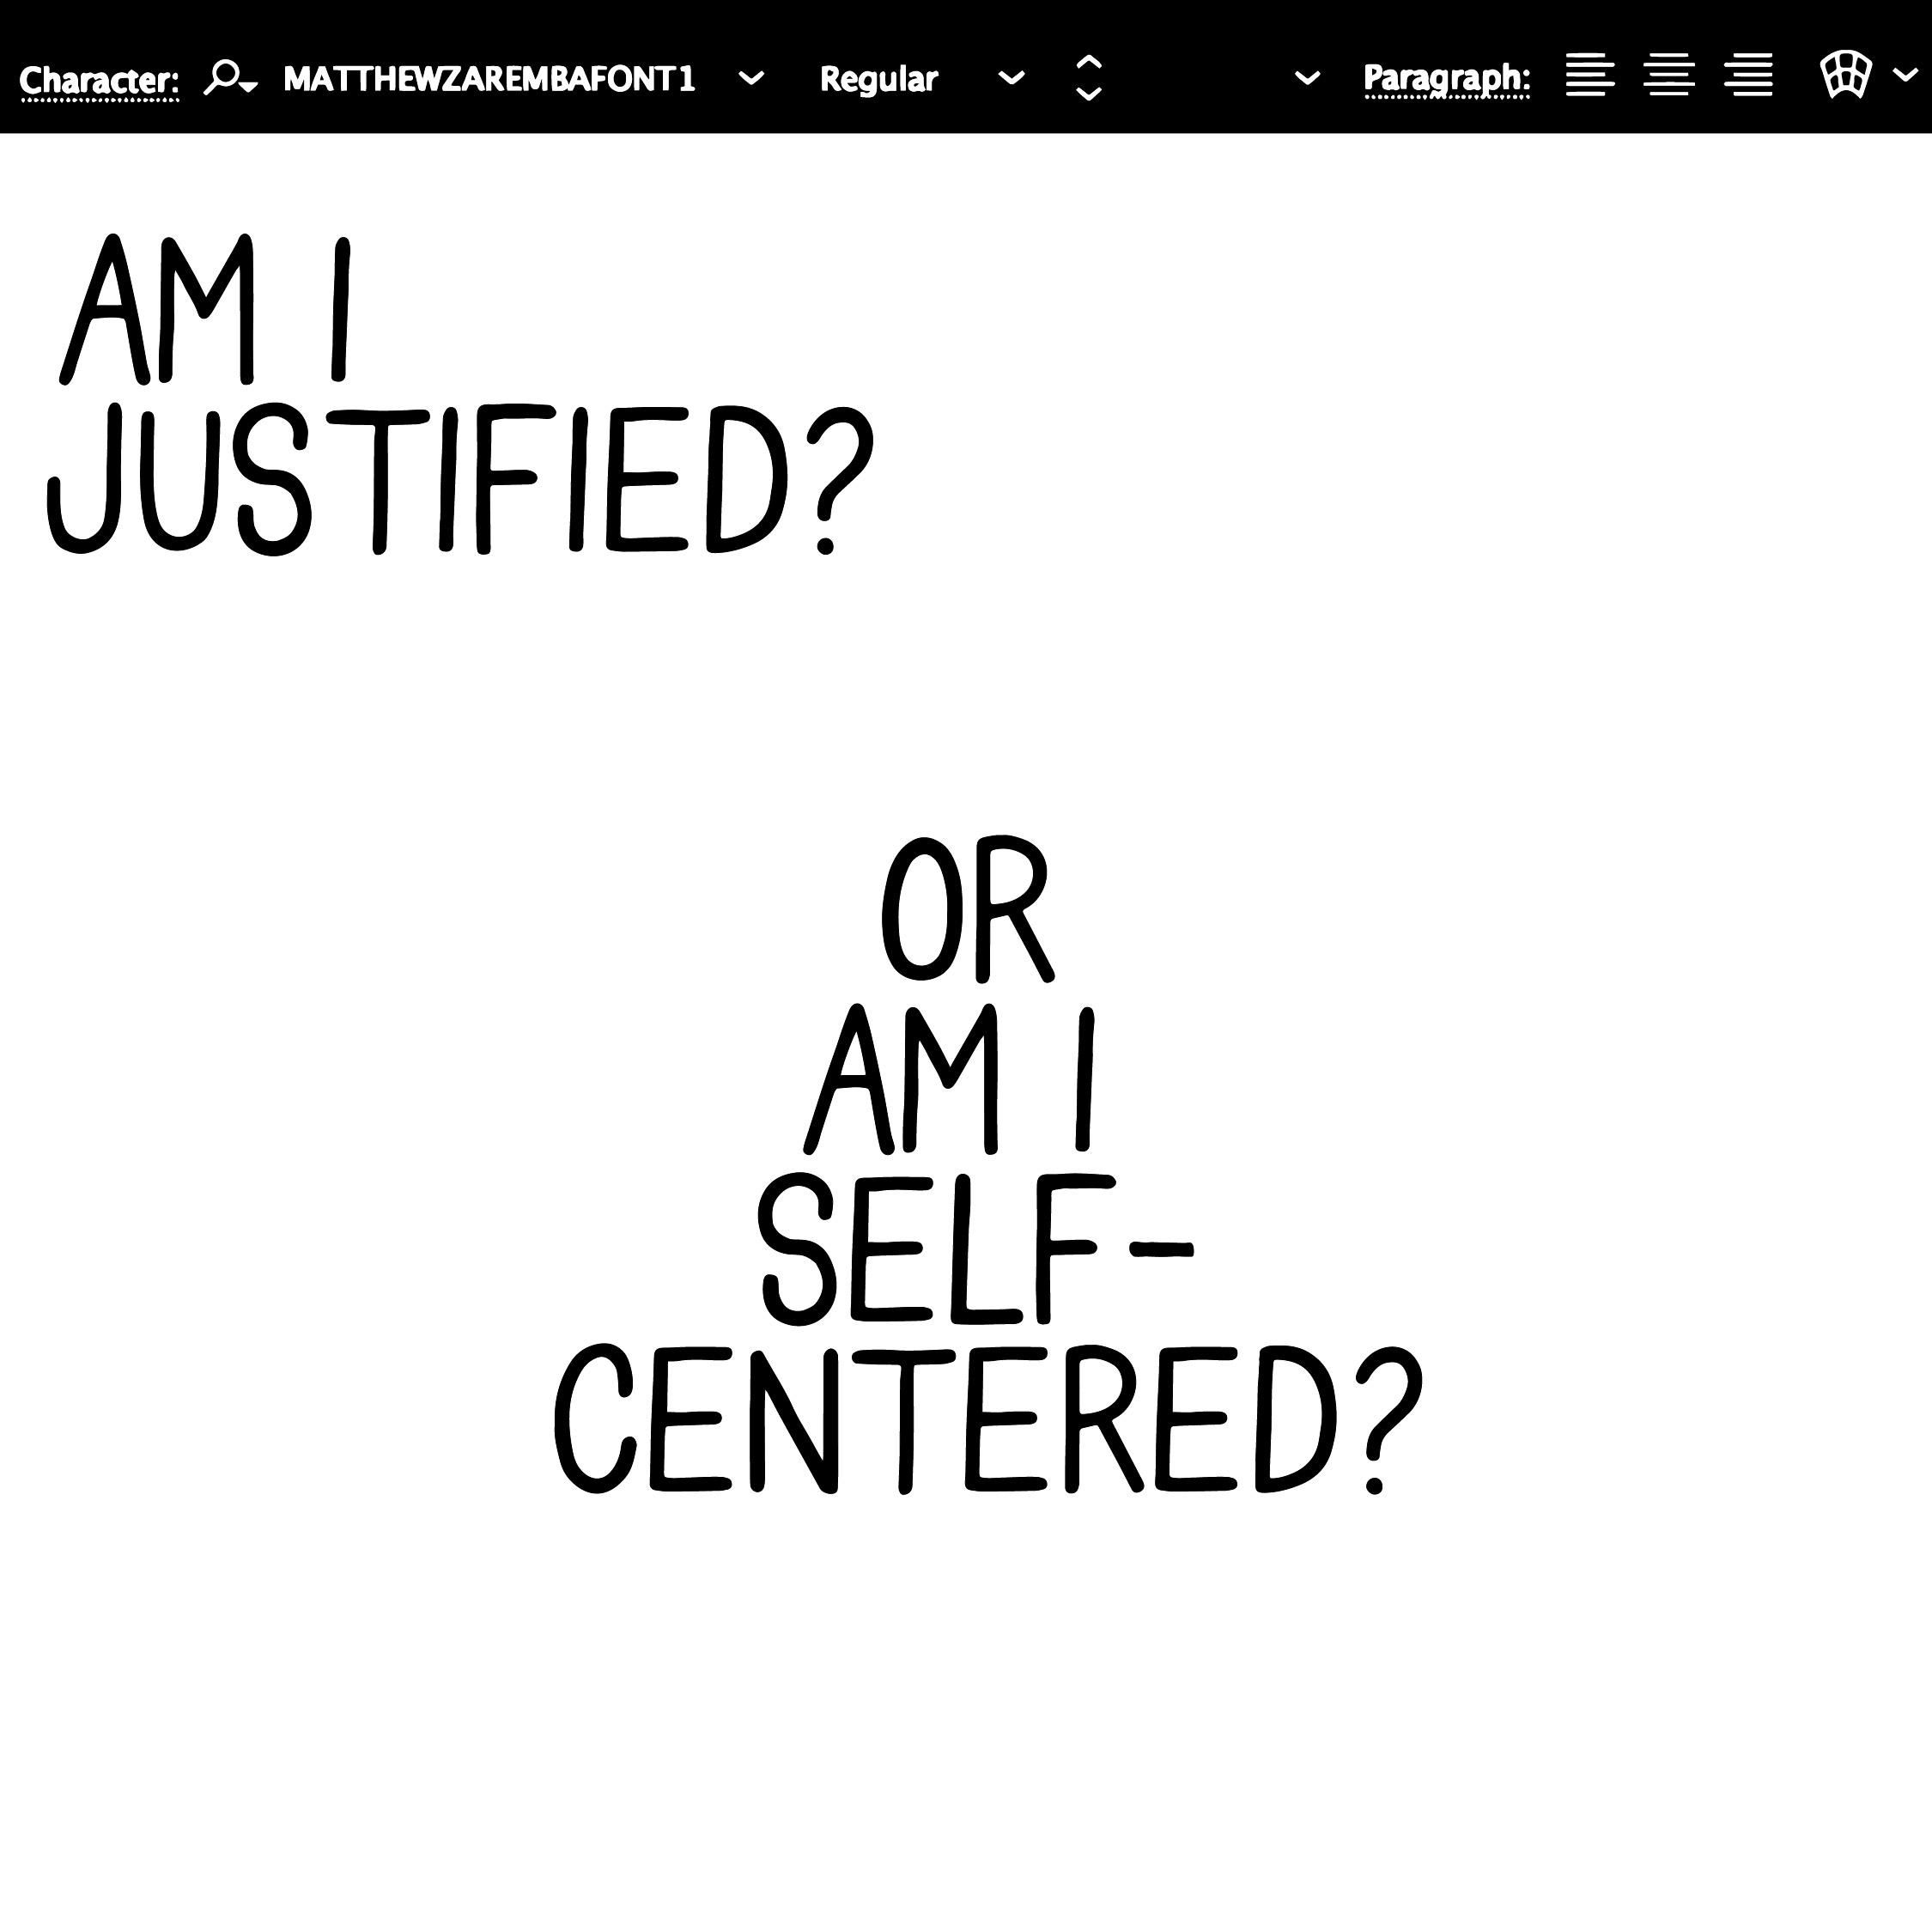 selfcentered-01.jpg